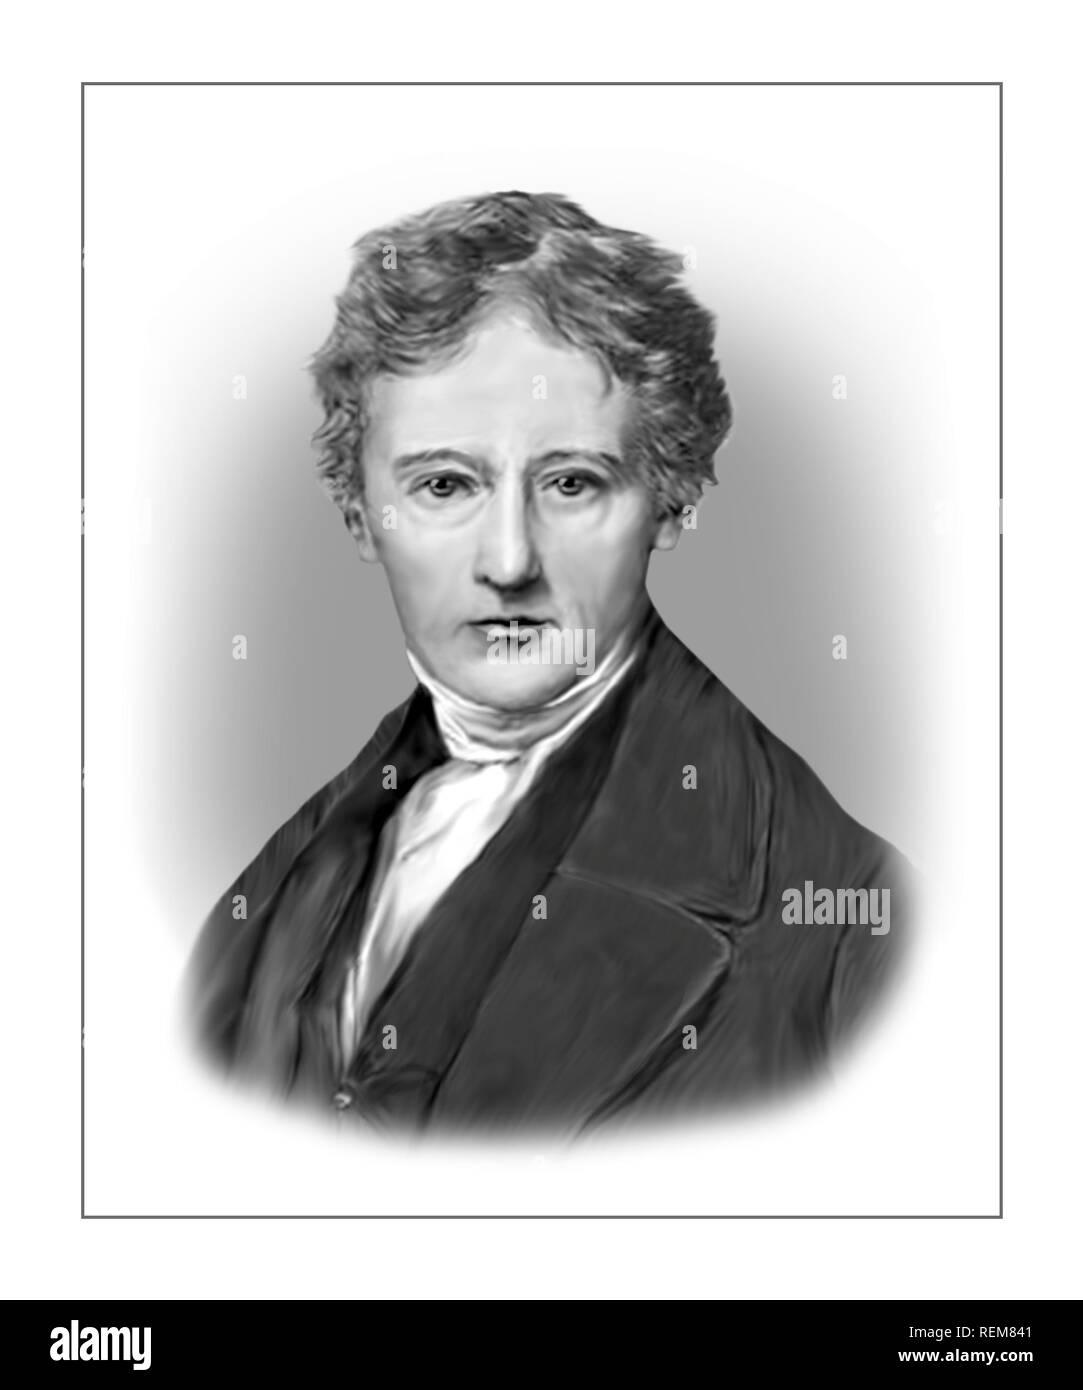 Charles Lamb 1775-1834 English Essayist Poet Antiquarian - Stock Image